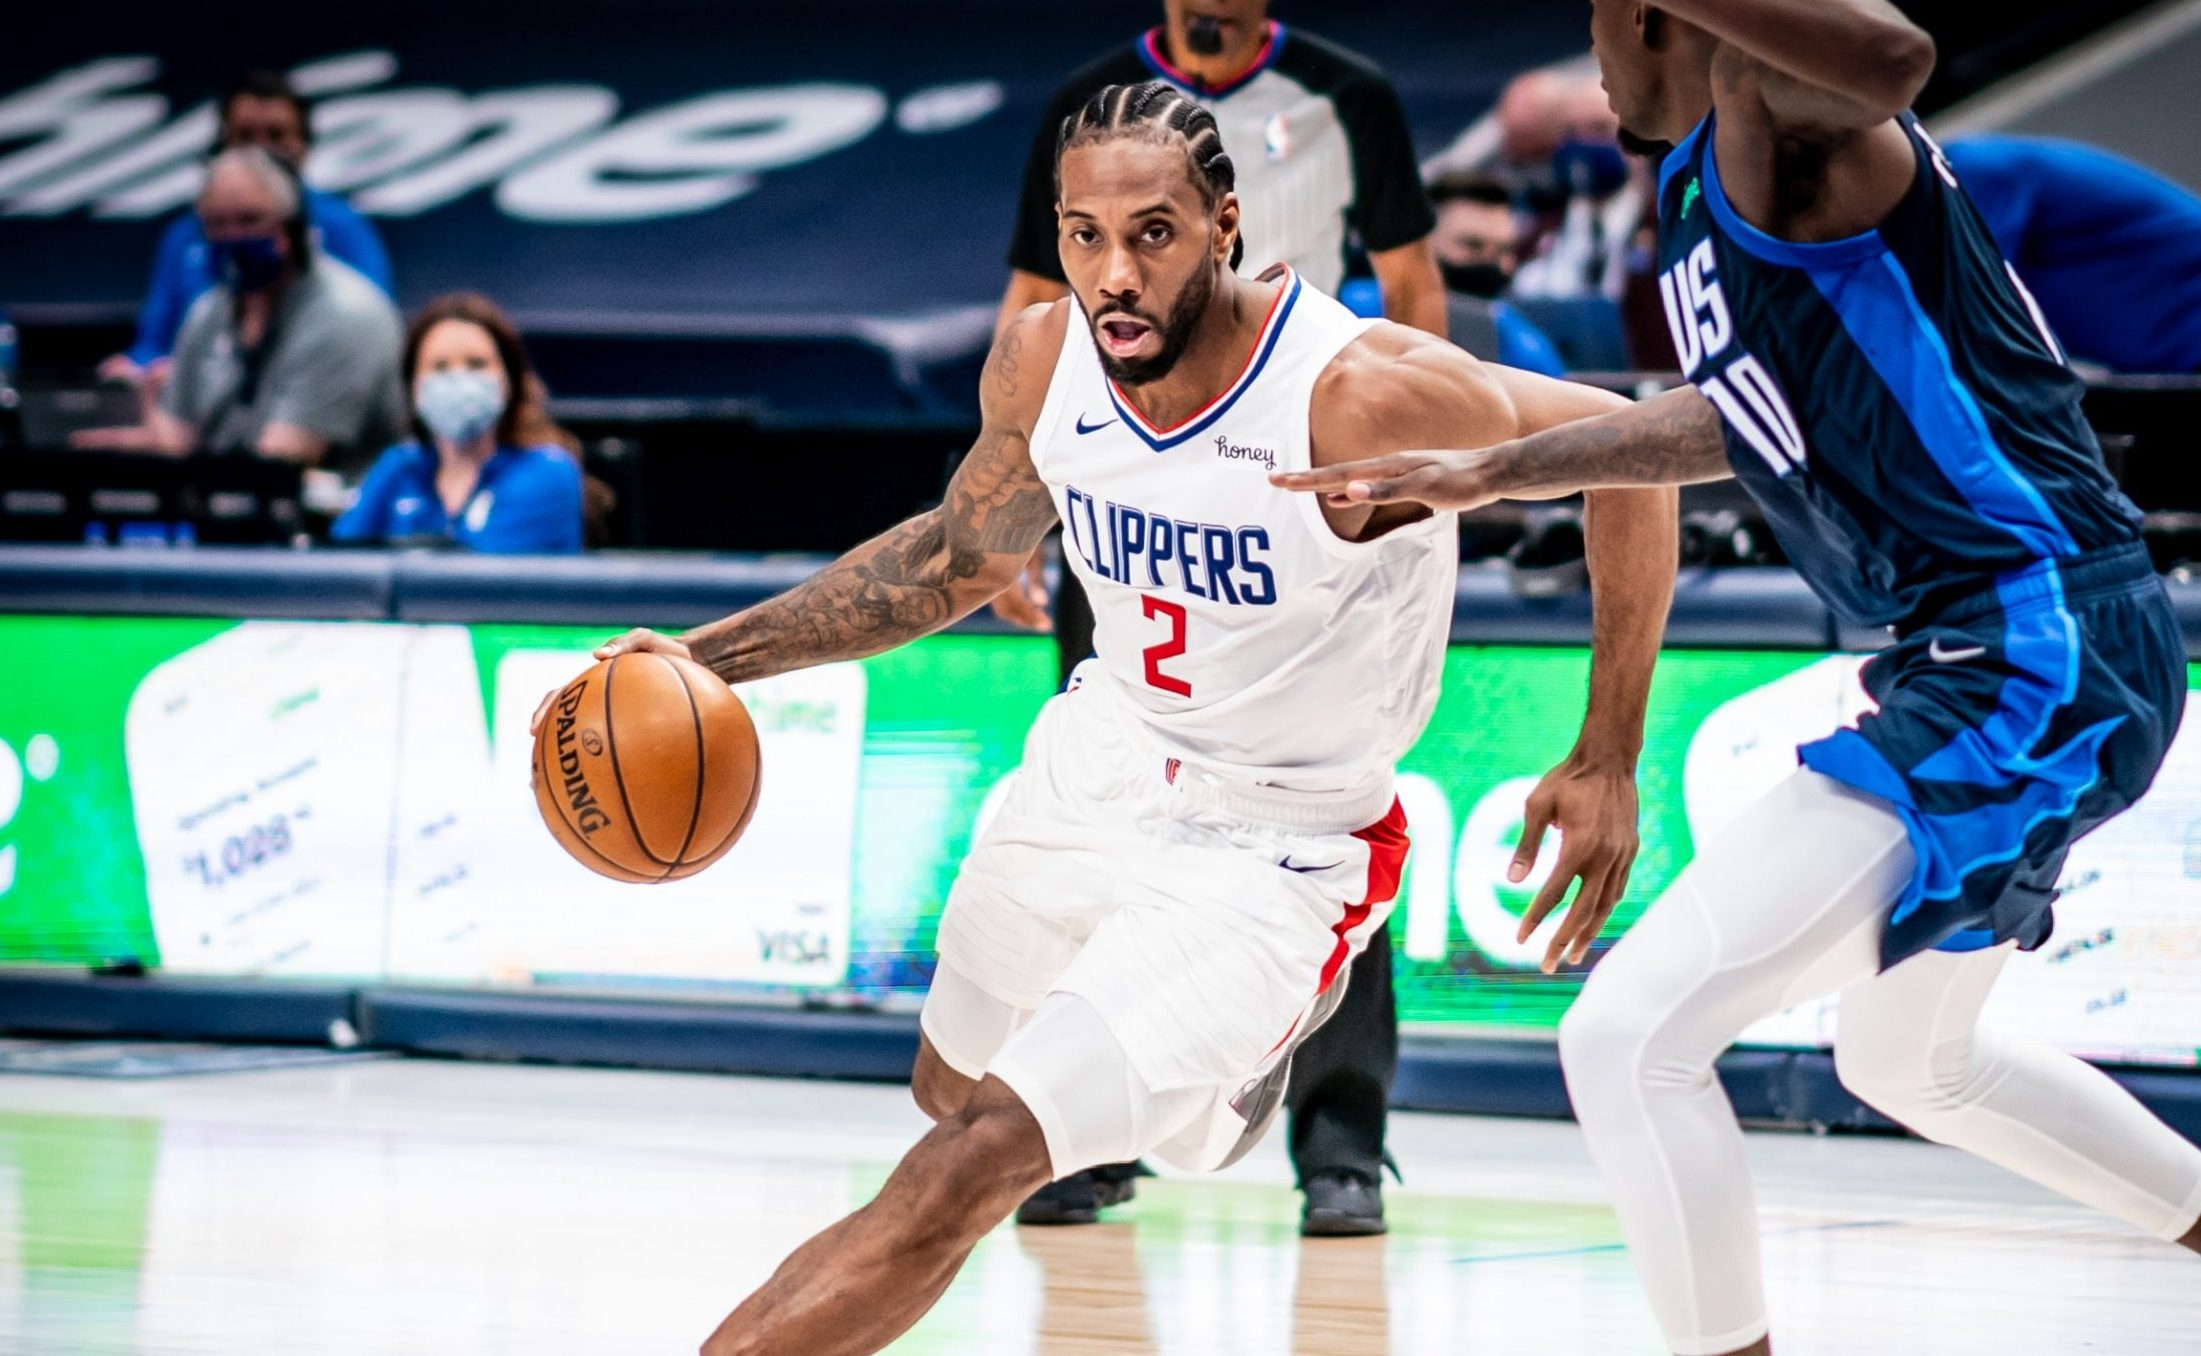 Clippers vs. Mavericks Game 6 Recap: Kawhi Dominates in Clippers' 104-97 Victory